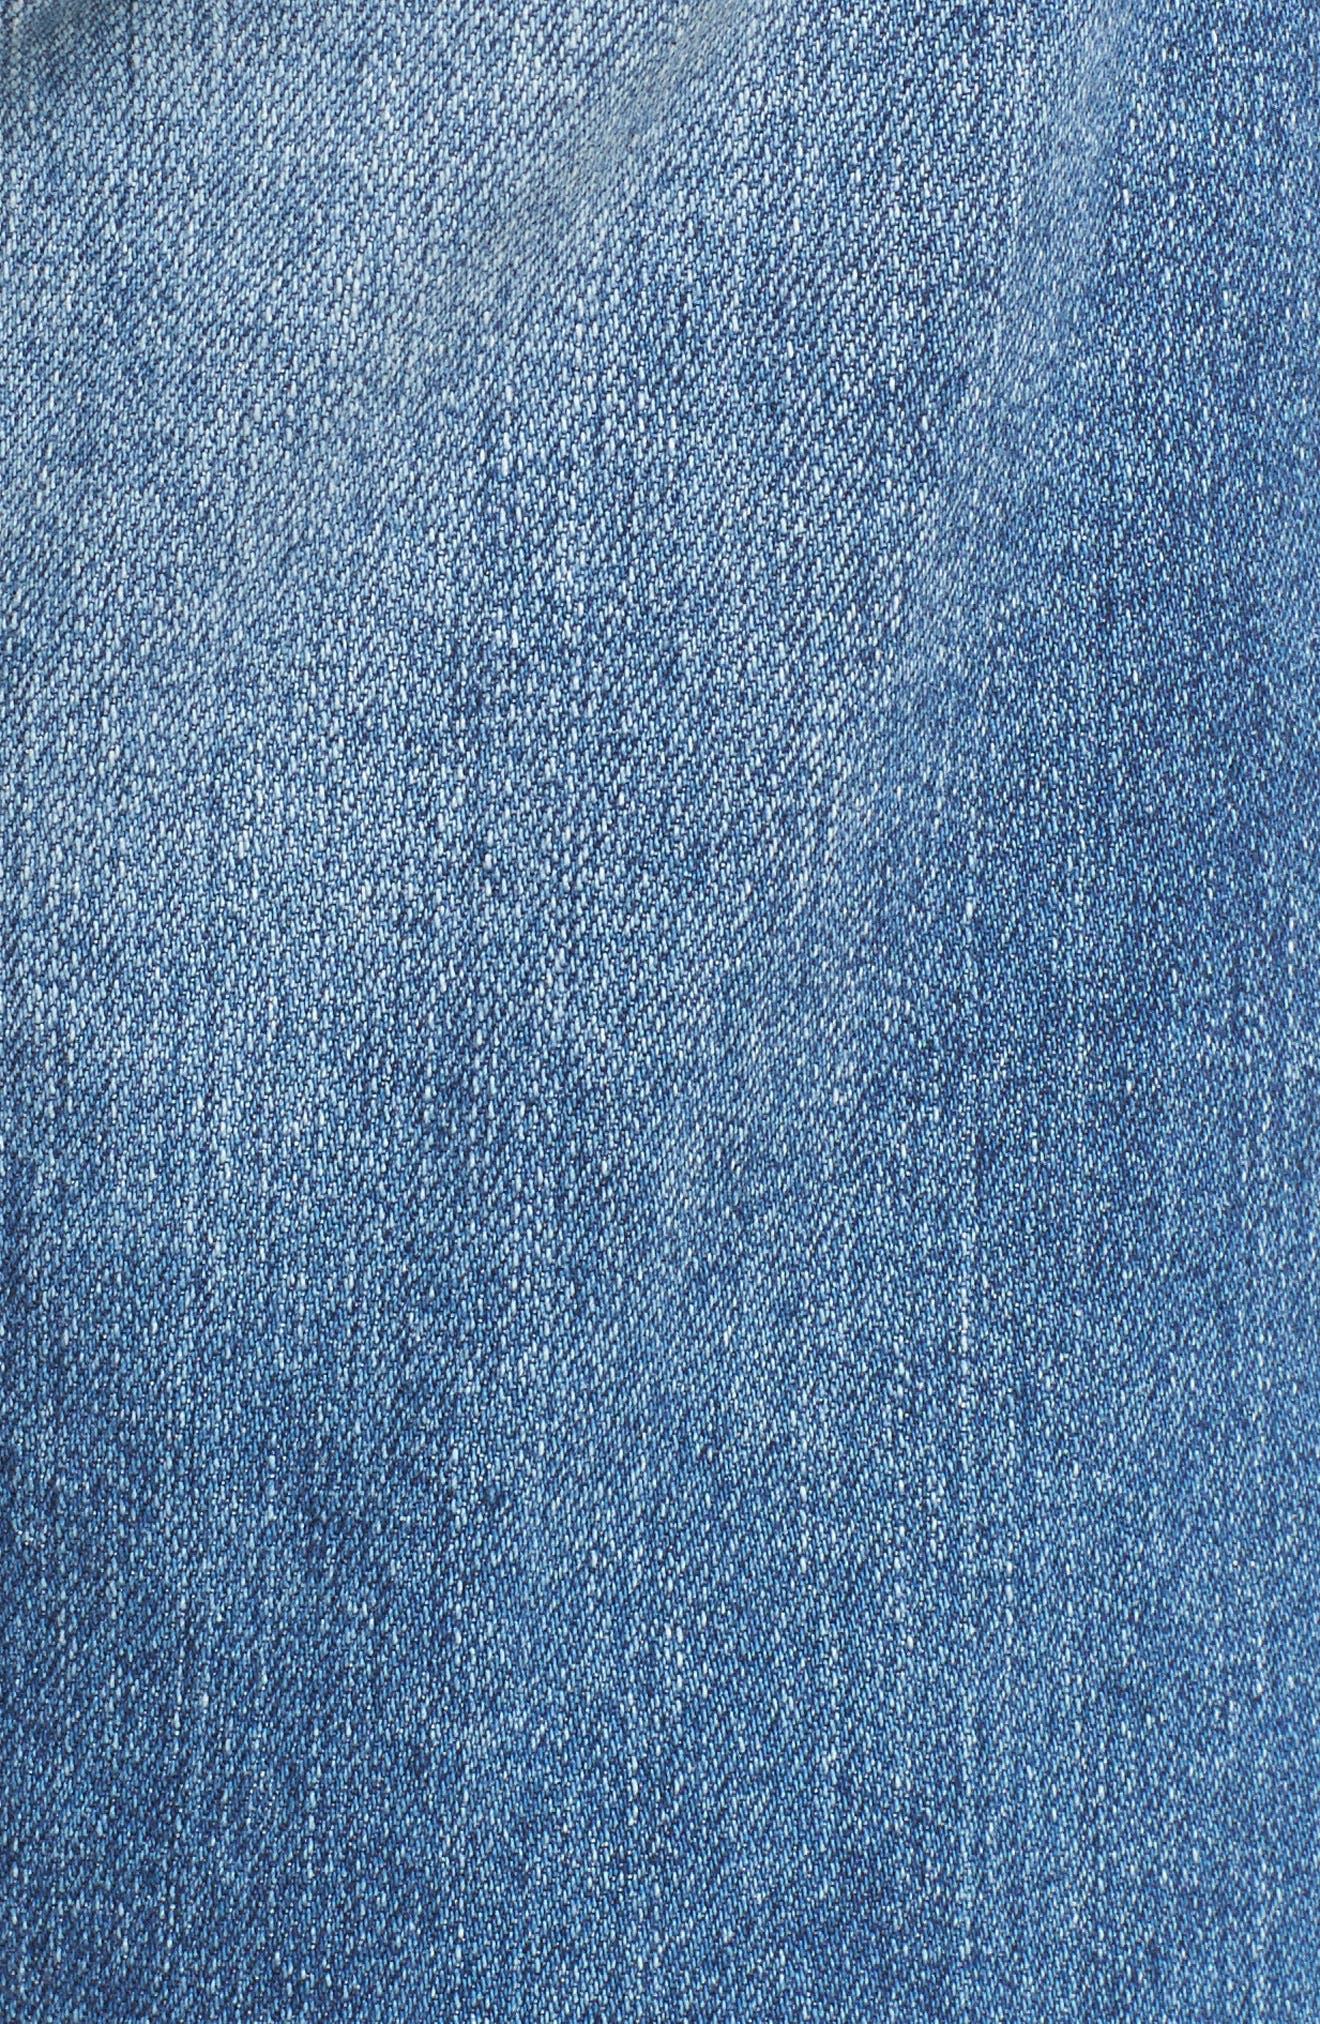 Nikki Cutoff Denim Shorts,                             Alternate thumbnail 6, color,                             16 Years Indigo Deluge Destr